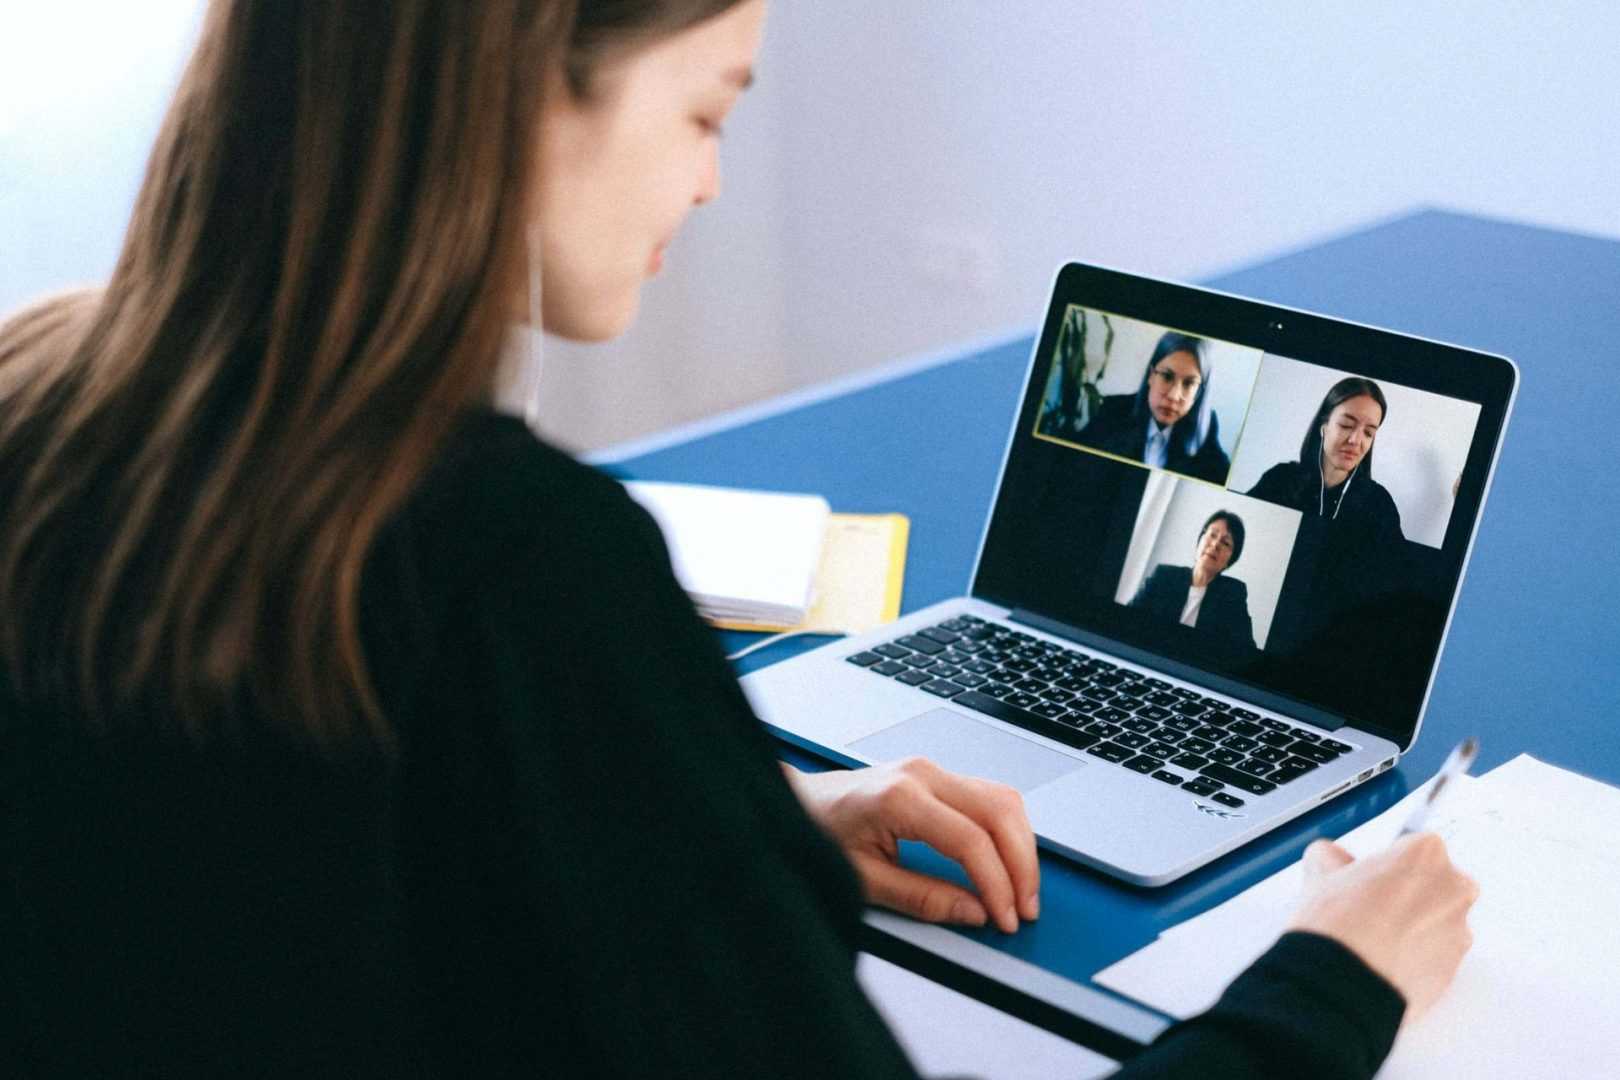 3 Simple Elearning Videos Preparation Hacks